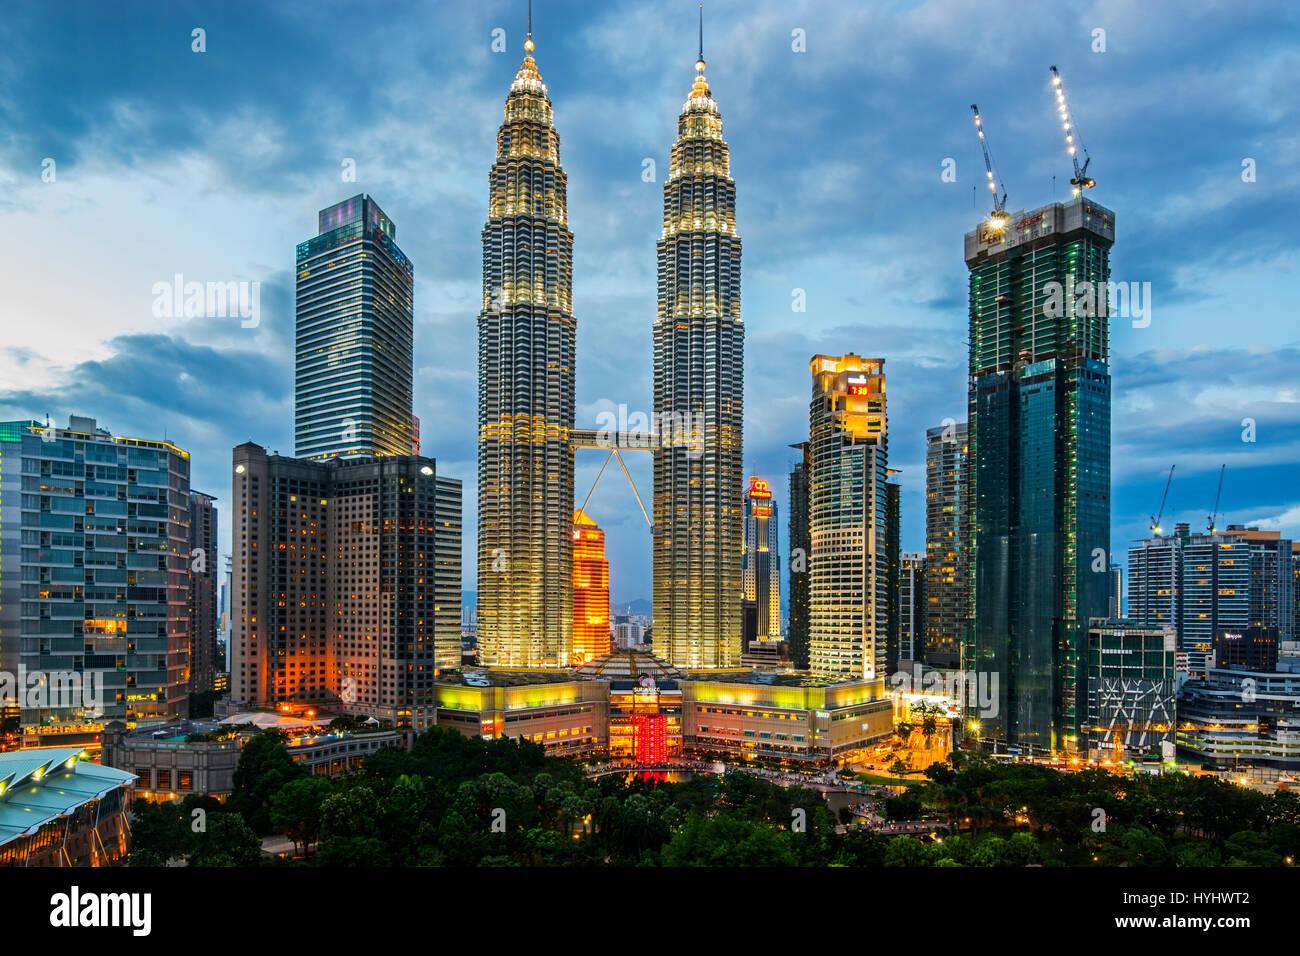 Kuala Lumpur Petronas Twin Towers e centro città panoramica, Malaysia Immagini Stock